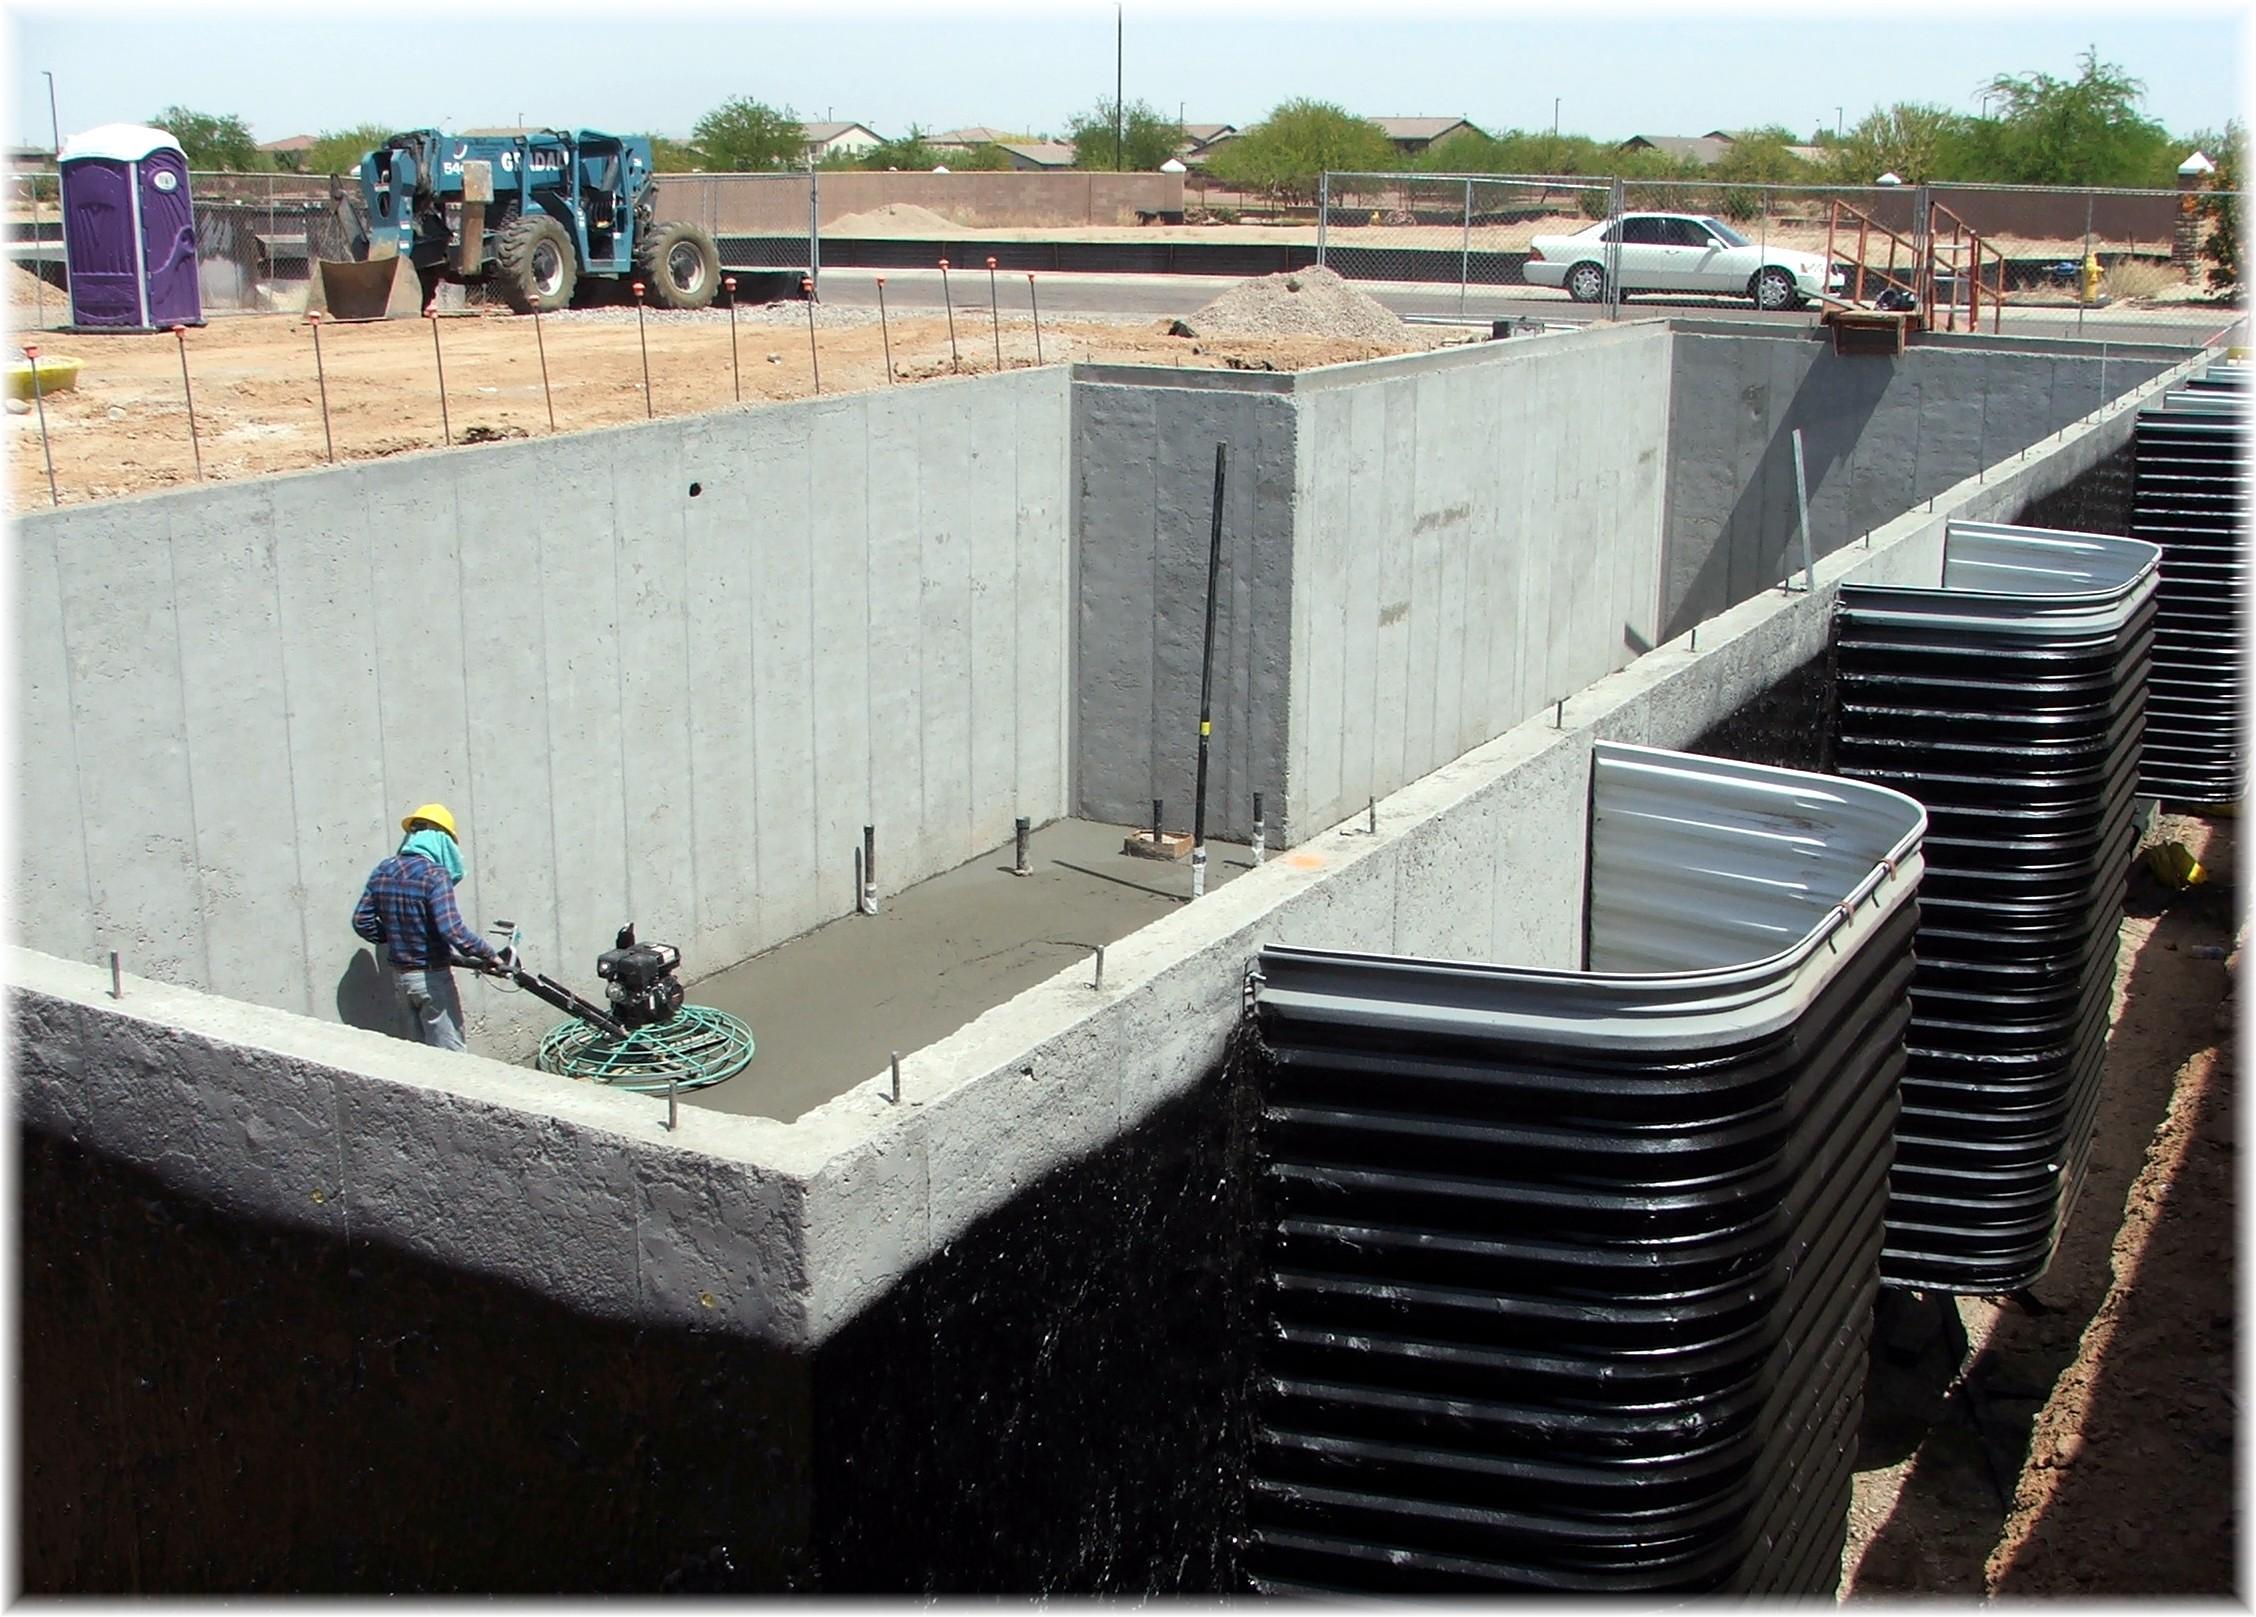 Phoenix Arizona Waterfront Homes Basement In The Making